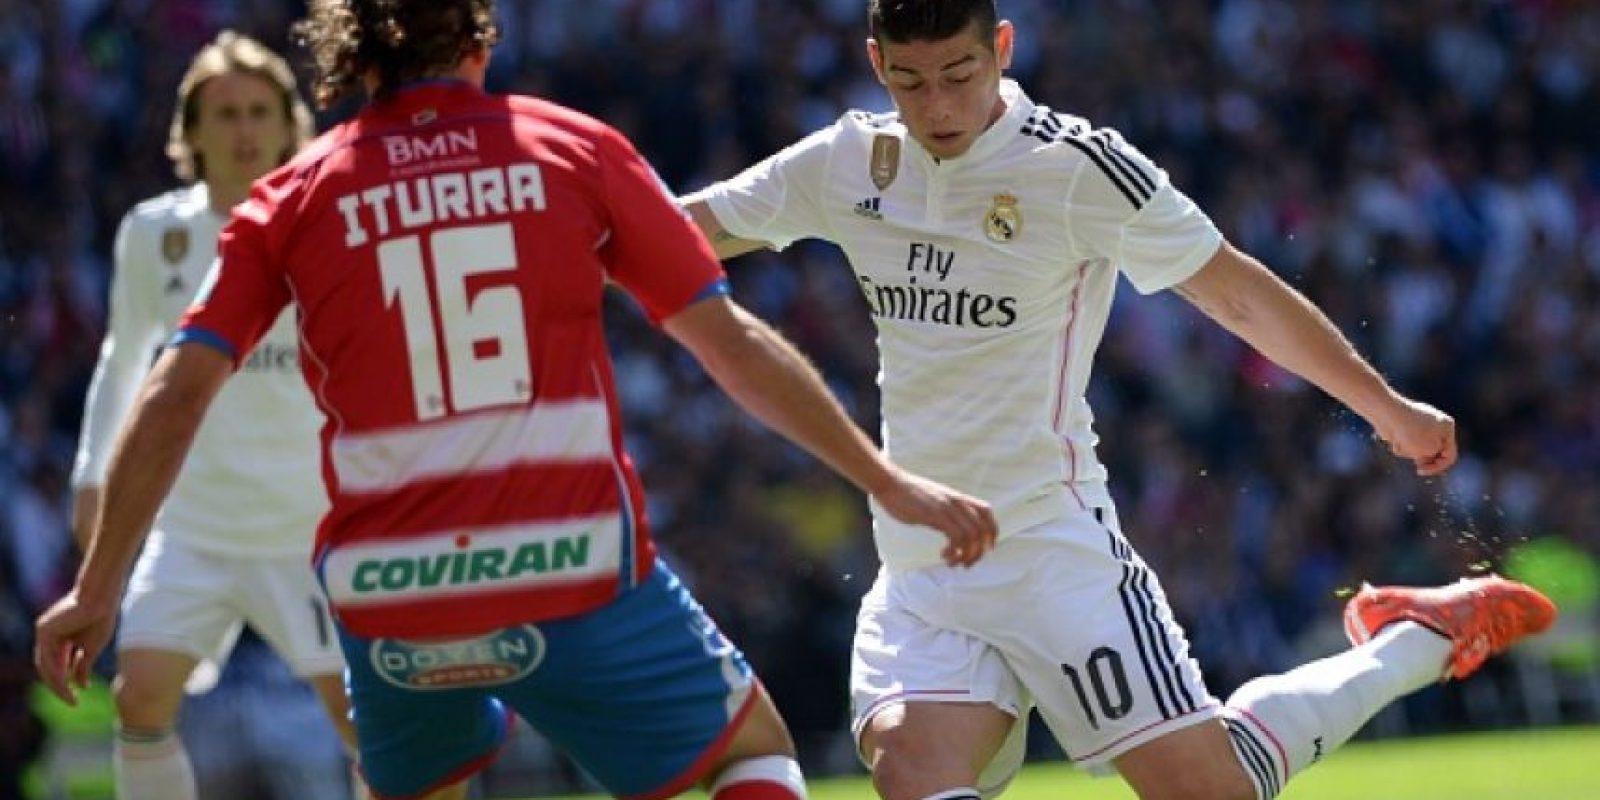 En ella, Cristiano Ronaldo anotó cinco goles. Foto:Getty Images